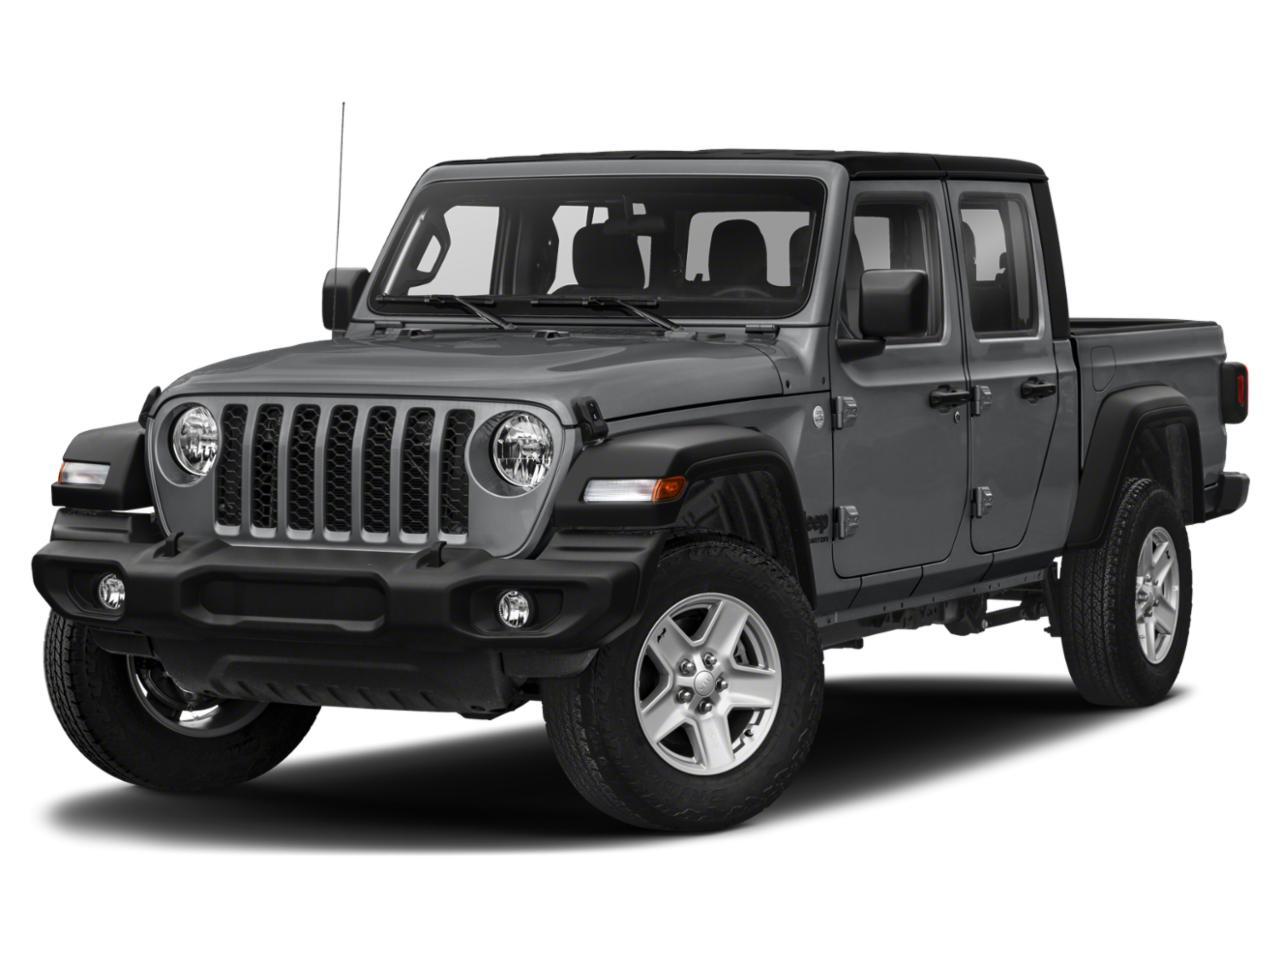 2020 Jeep Gladiator Vehicle Photo in Smyrna, GA 30080